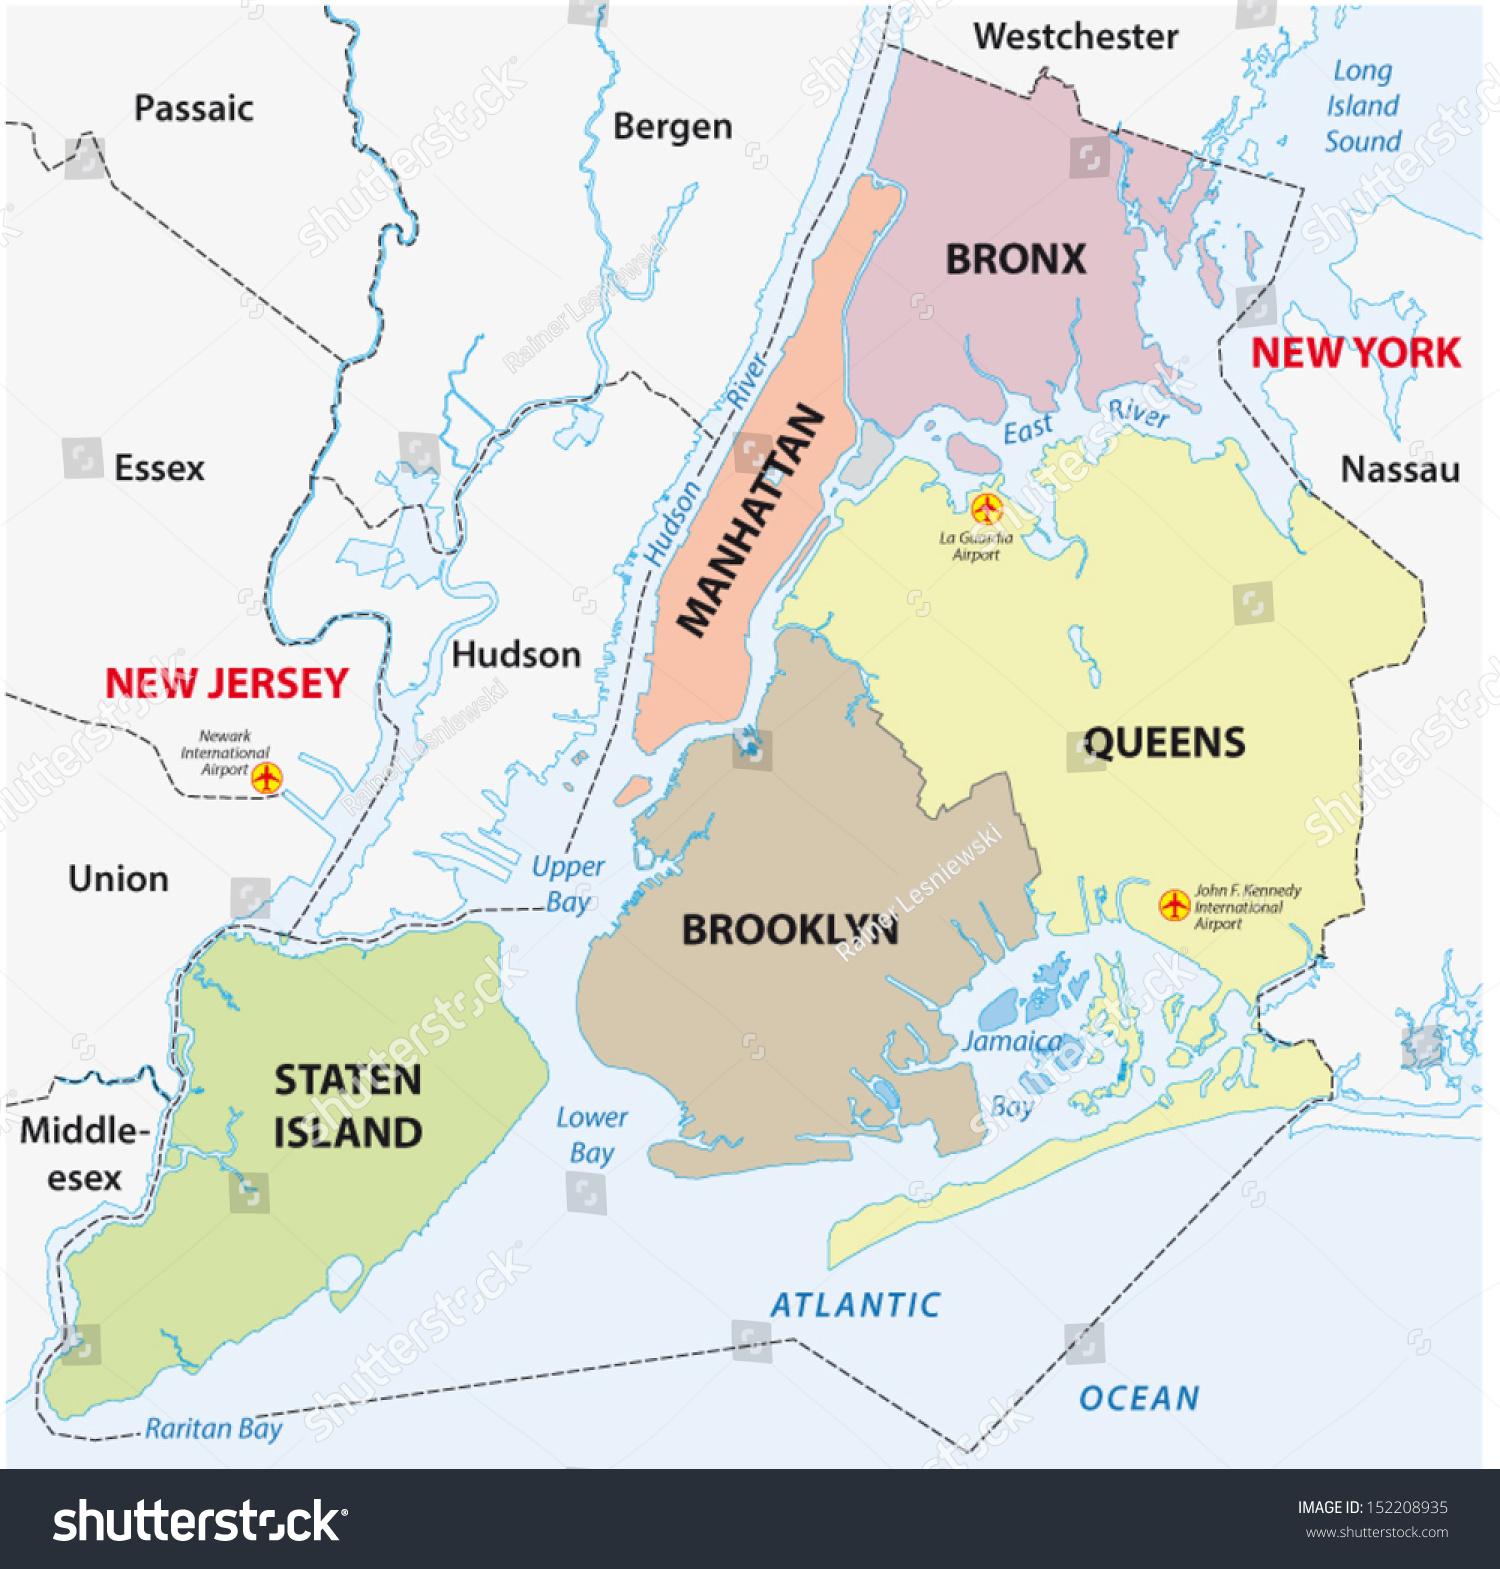 new york city 5 boroughs map stock vector shutterstock